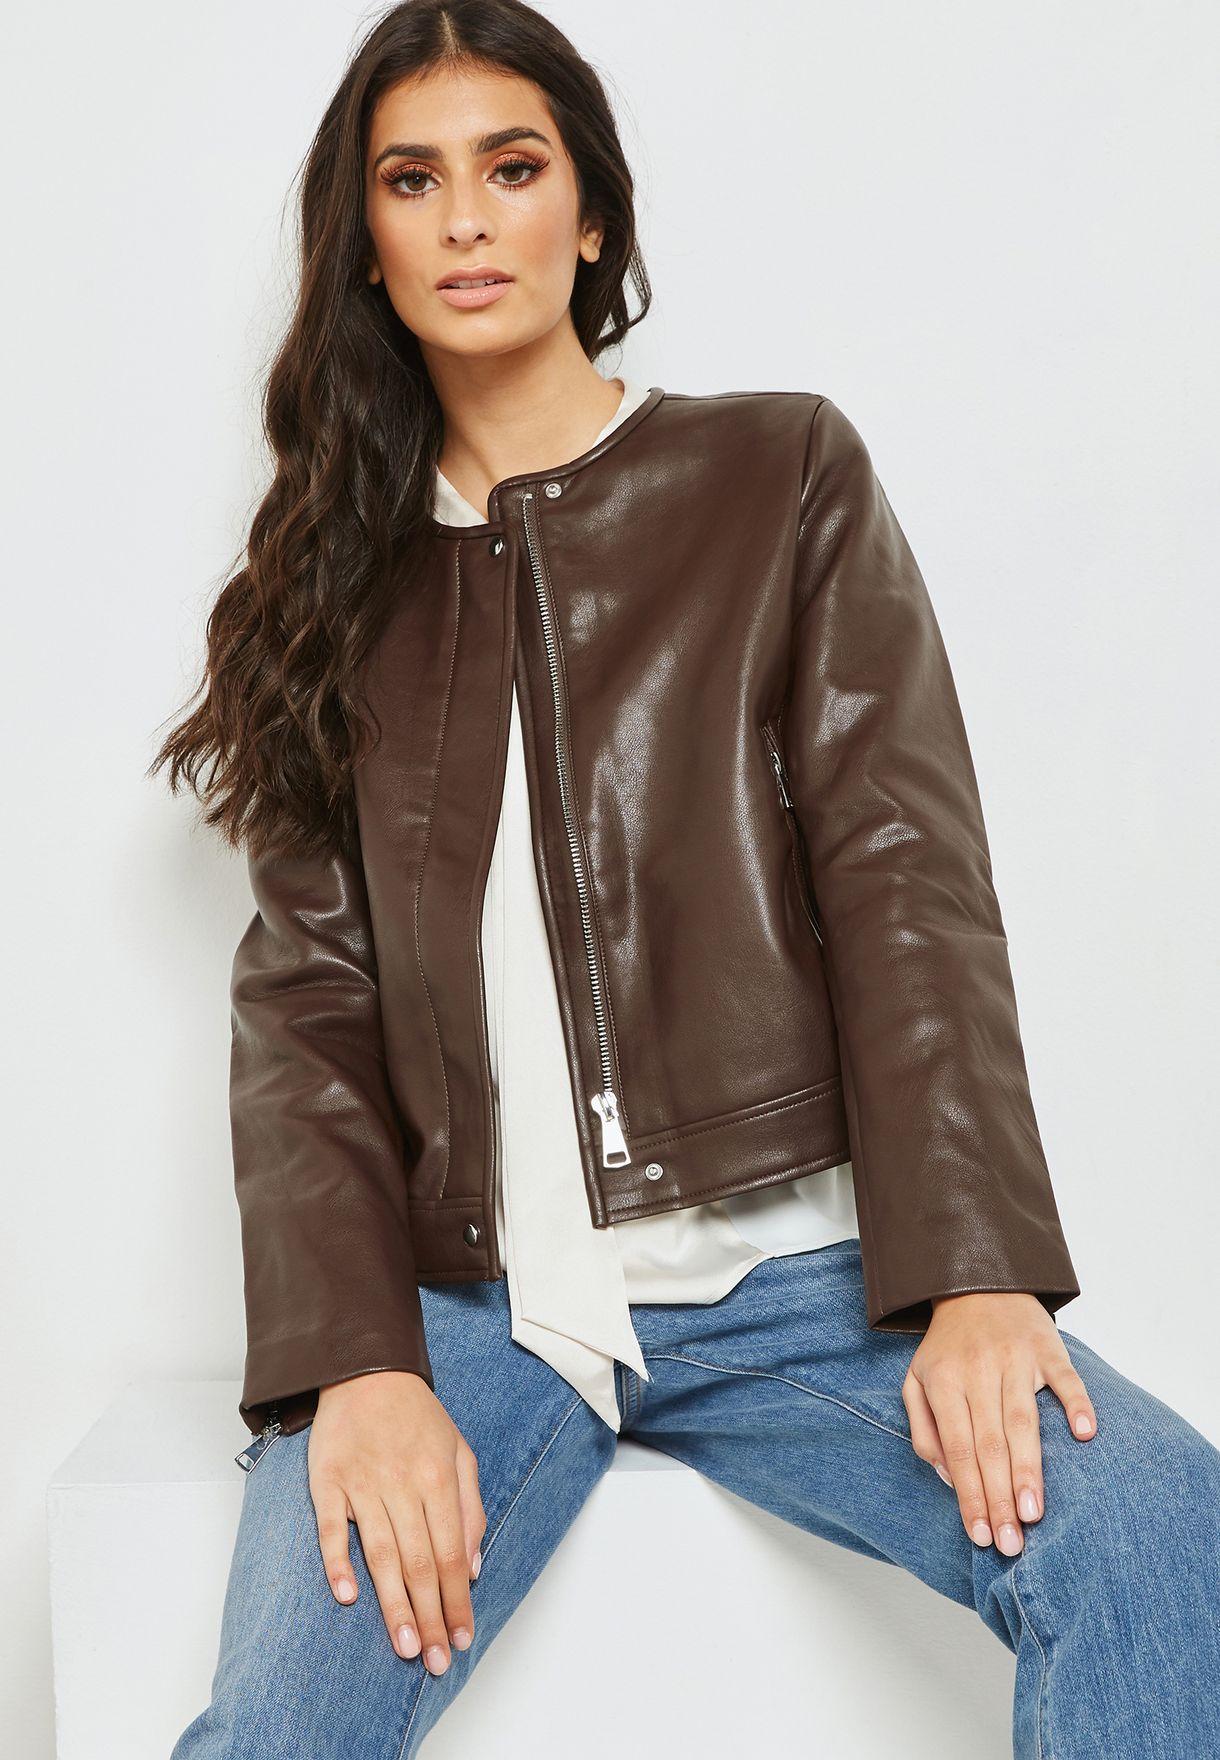 Buy Mango Brown Pu Biker Jacket For Women In Mena Worldwide 33063021